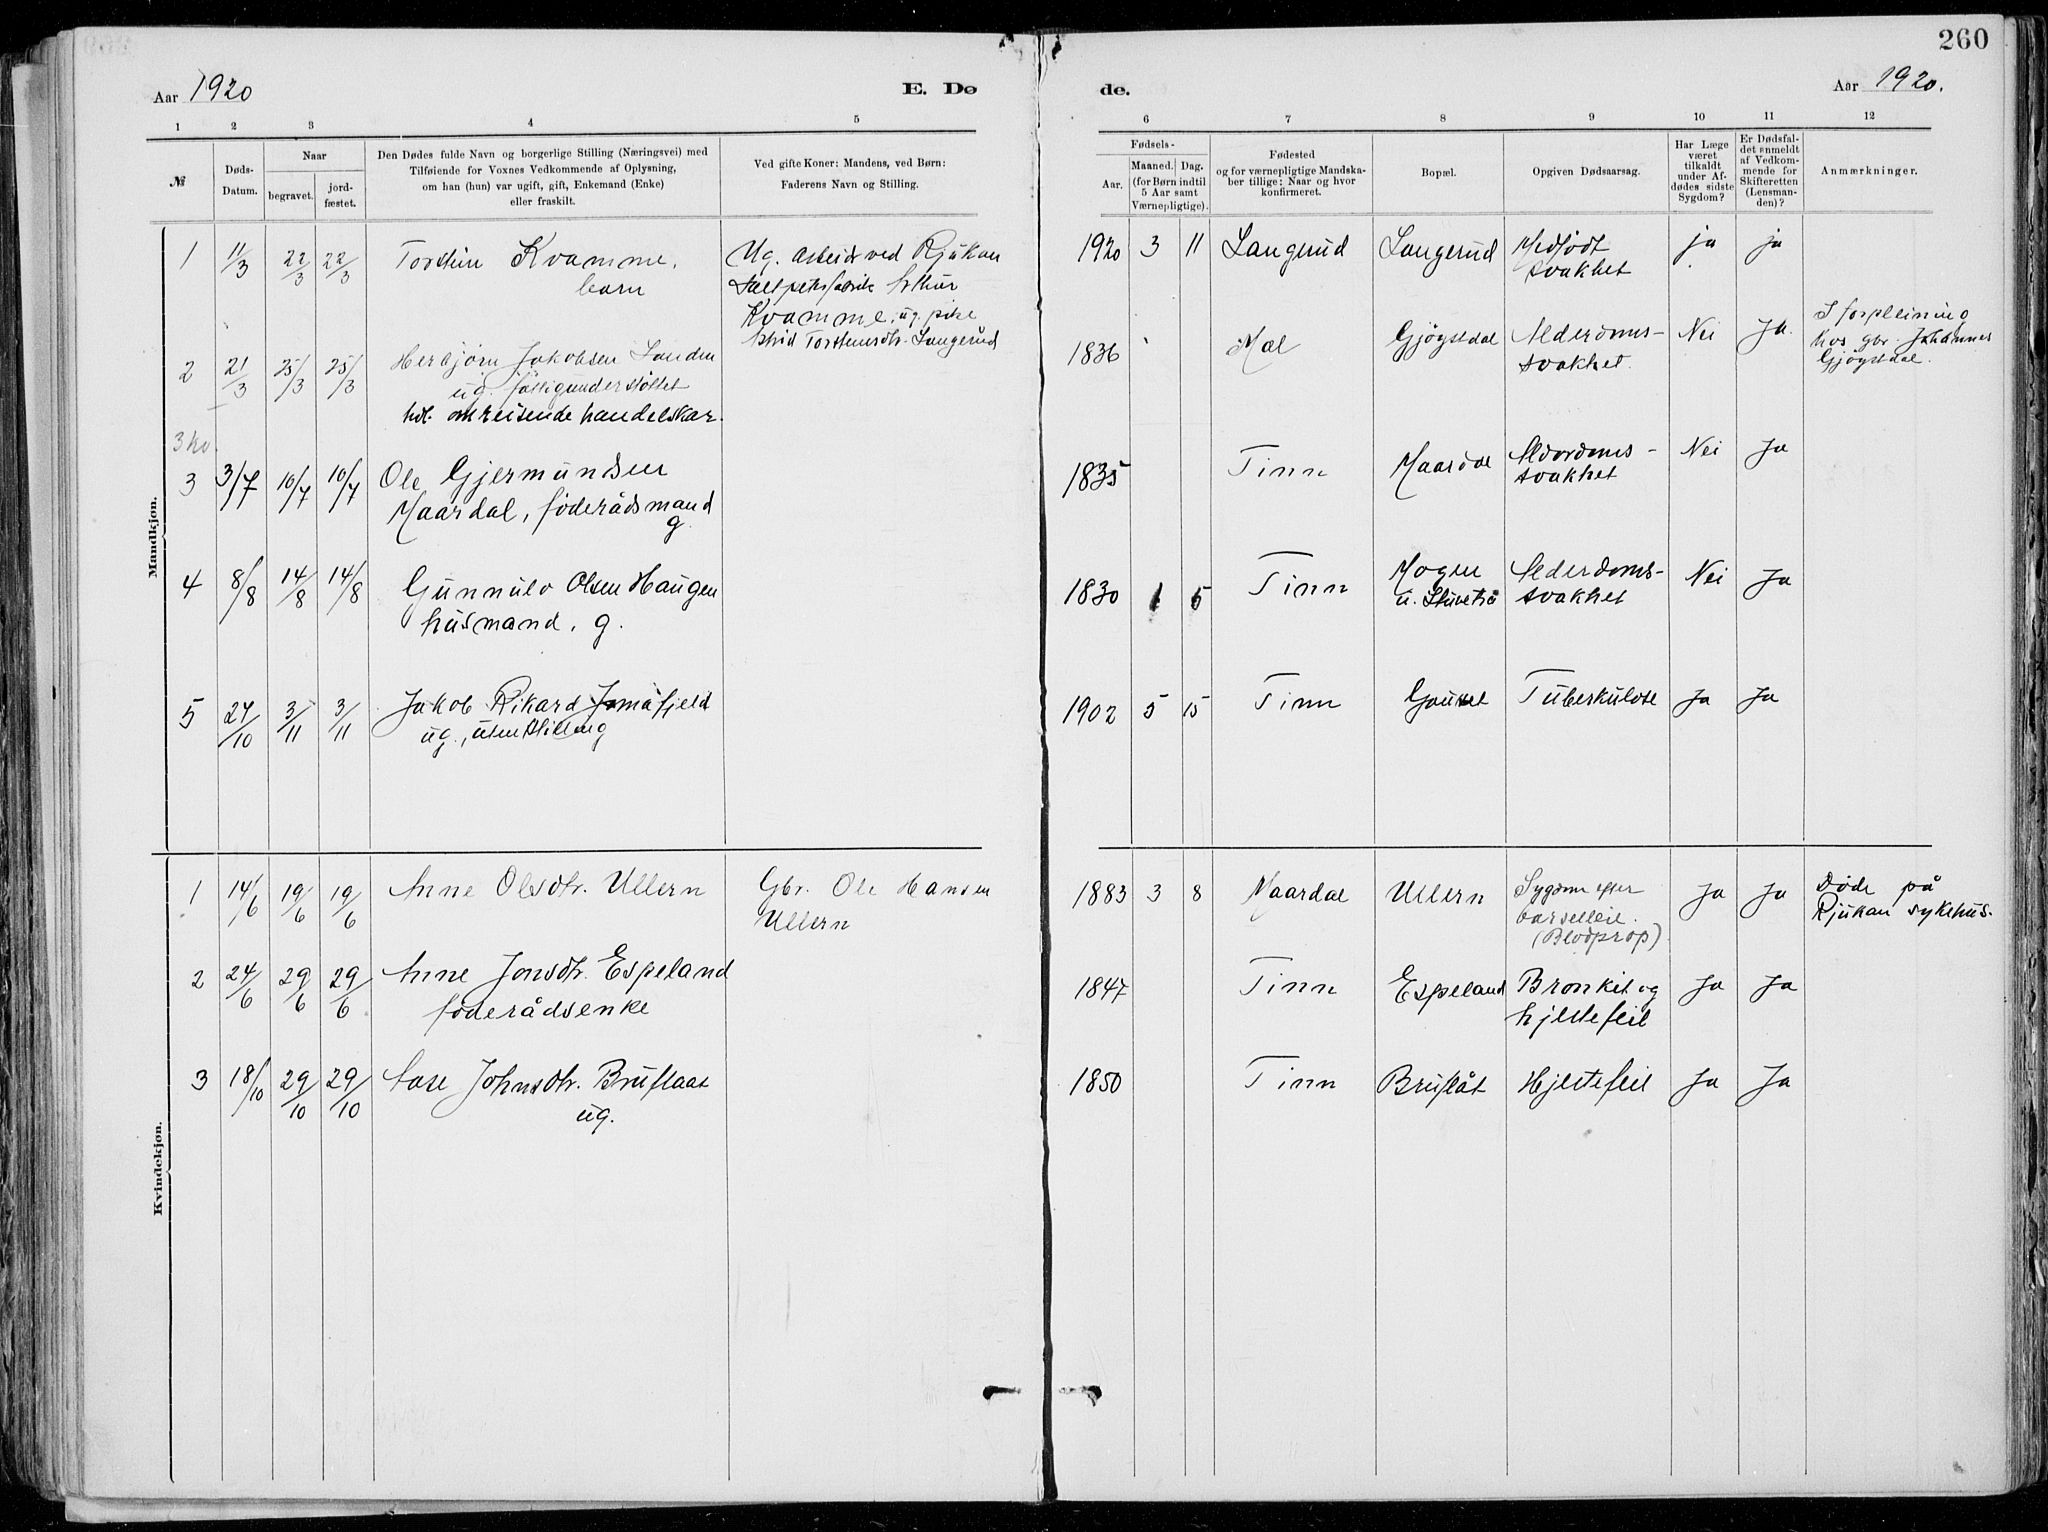 SAKO, Tinn kirkebøker, F/Fa/L0007: Ministerialbok nr. I 7, 1878-1922, s. 260